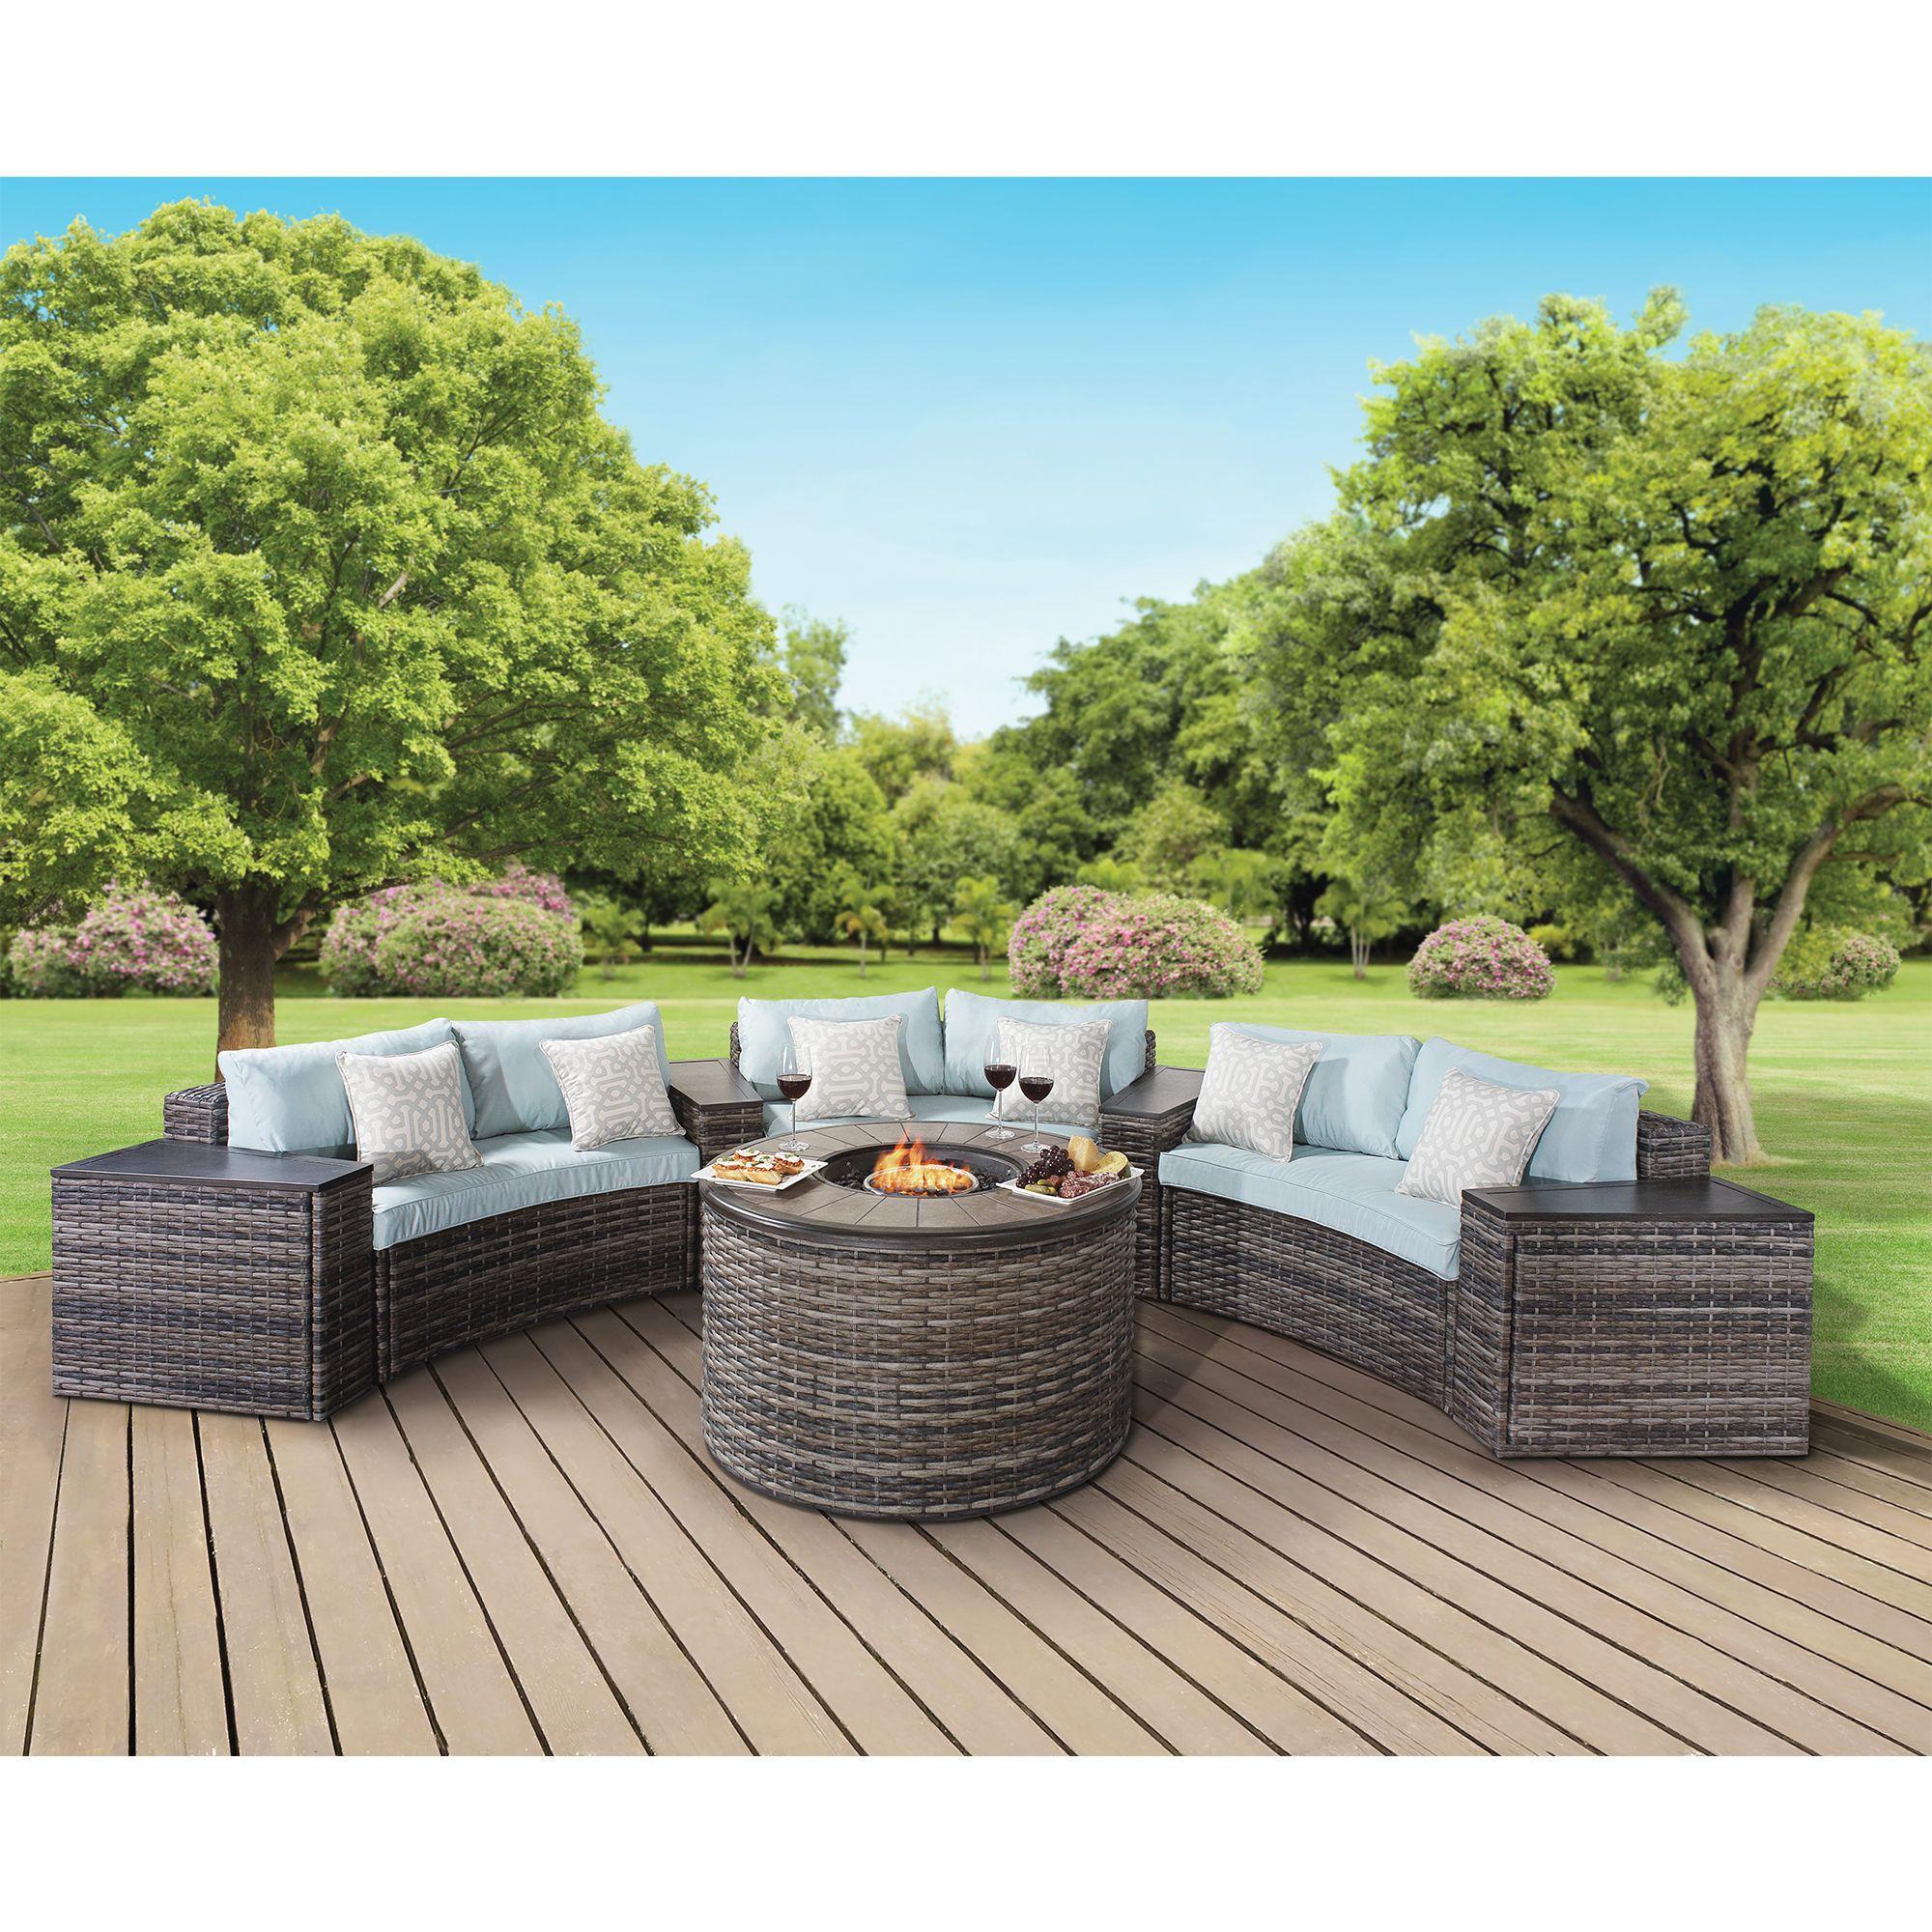 Berkley Jensen Hull 8 Pc Fire Chat Set Outdoor Furniture Sets Patio Patio Furniture